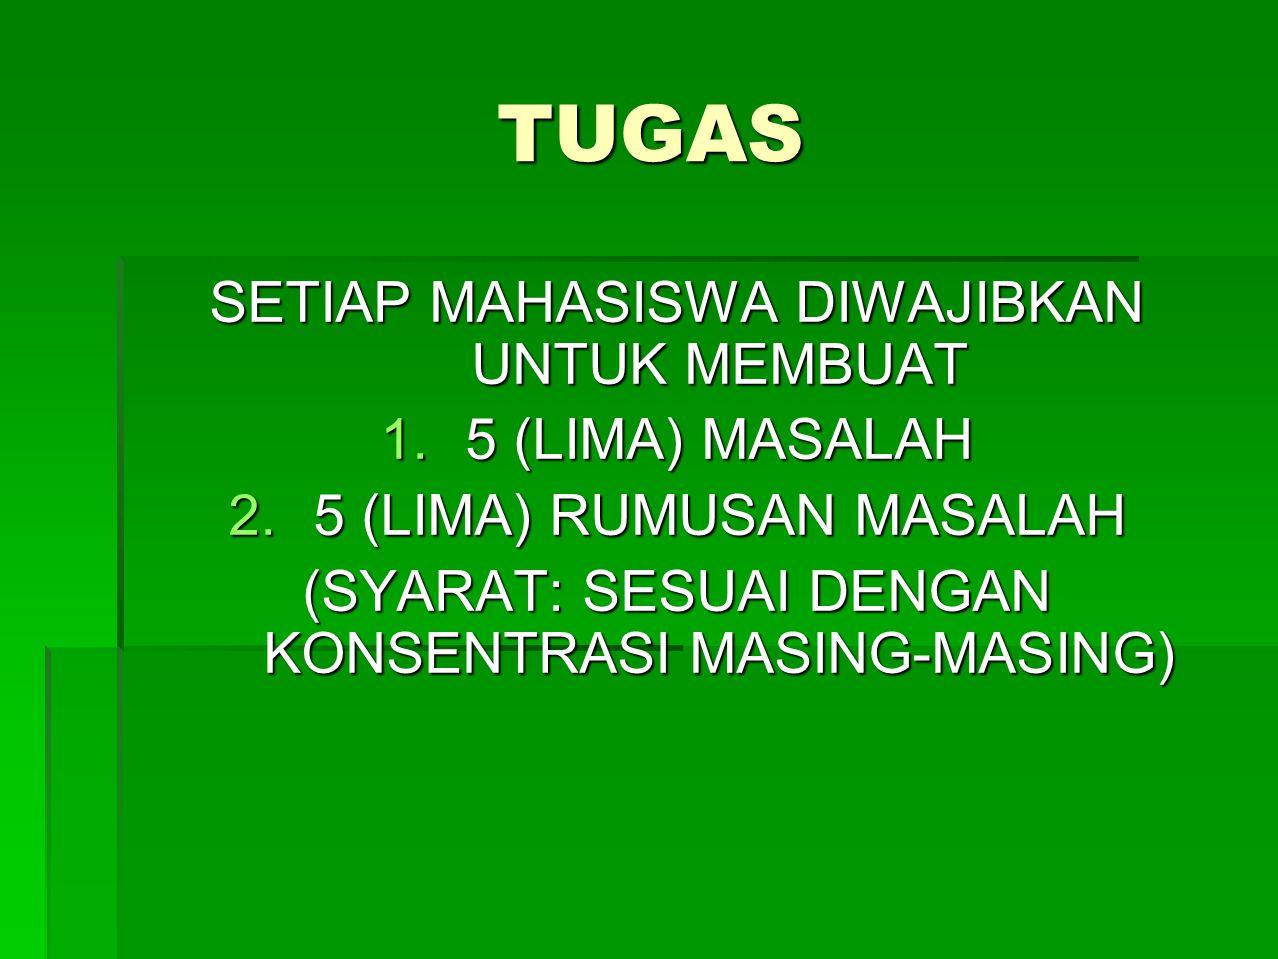 TUGAS SETIAP MAHASISWA DIWAJIBKAN UNTUK MEMBUAT 1.5 (LIMA) MASALAH 2.5 (LIMA) RUMUSAN MASALAH (SYARAT: SESUAI DENGAN KONSENTRASI MASING-MASING)